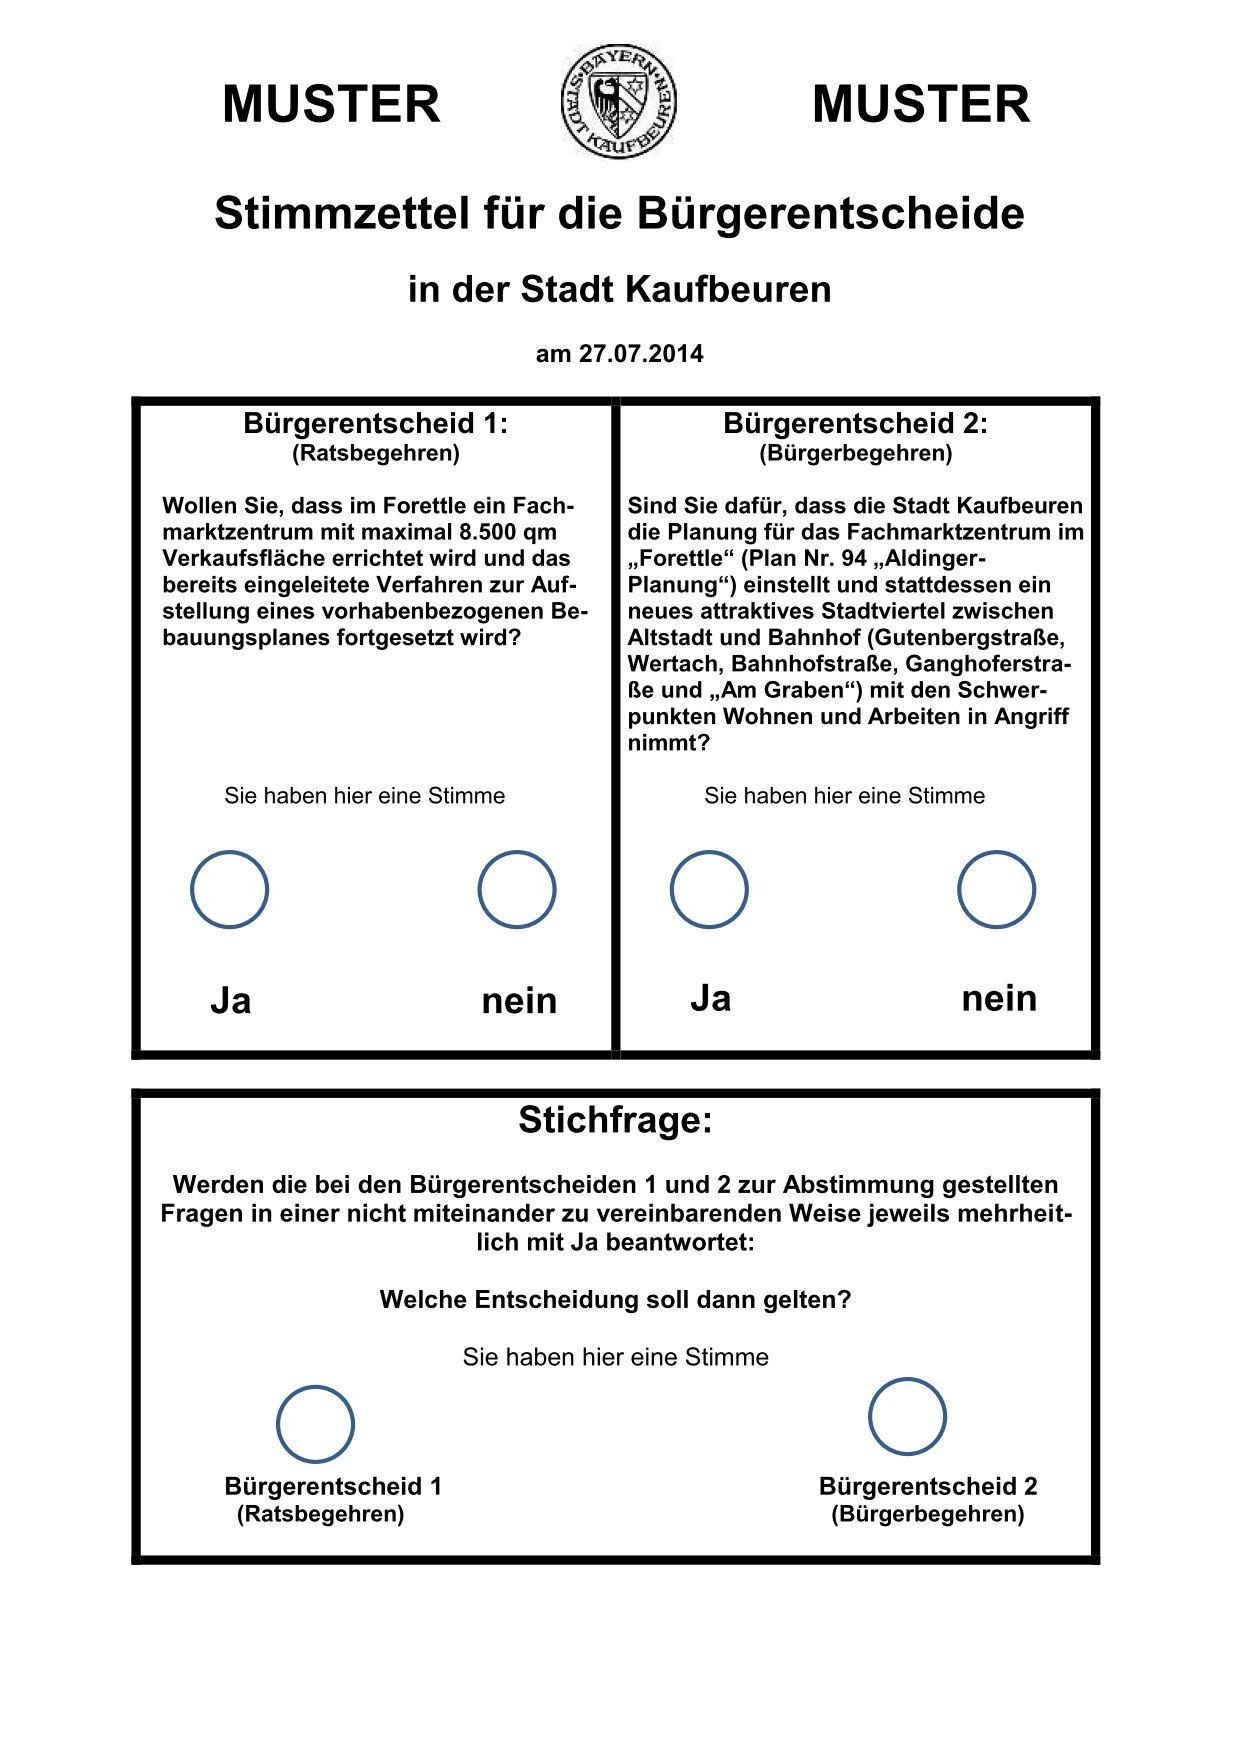 Muster_Stimmzettle_Buergerentscheide_20170727